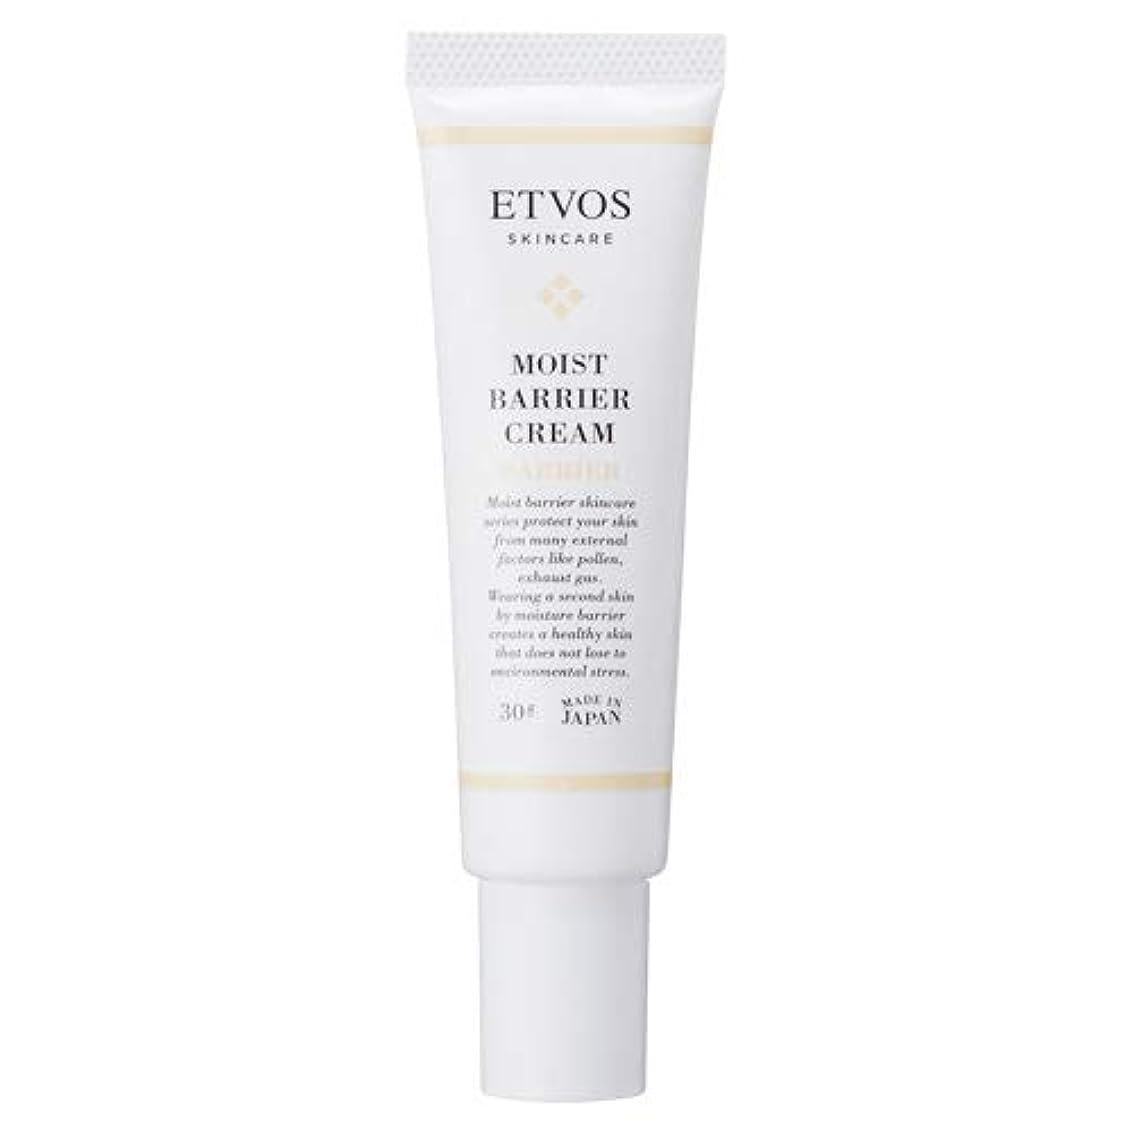 ETVOS(エトヴォス) 皮膚保護クリーム モイストバリアクリーム 30g 肌荒れ/敏感肌 花粉/PM2.5/ハウスダスト